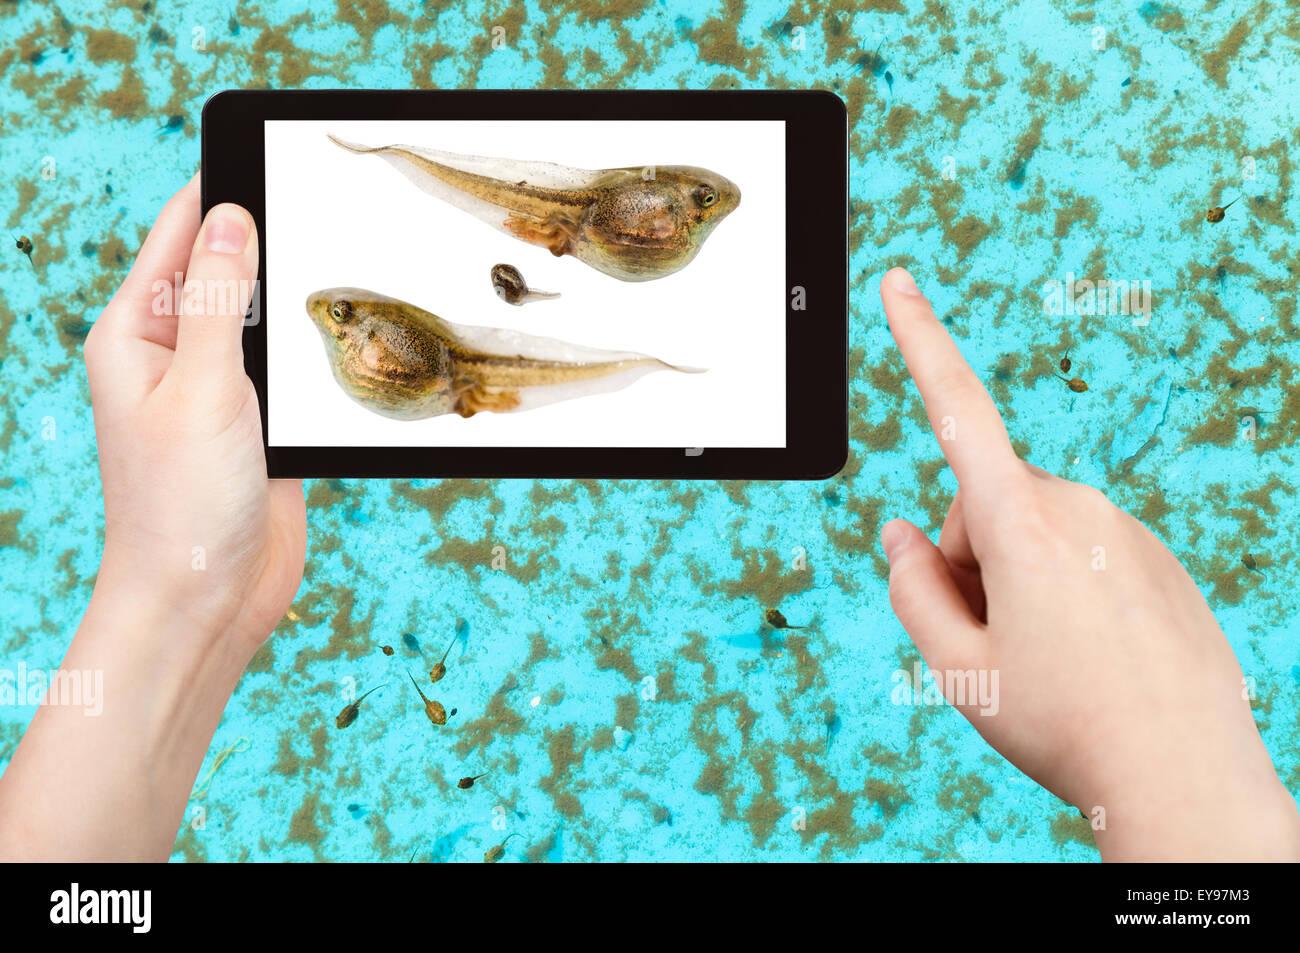 naturalist studies tadpoles of frog in water pool on tablet pc - Stock Image